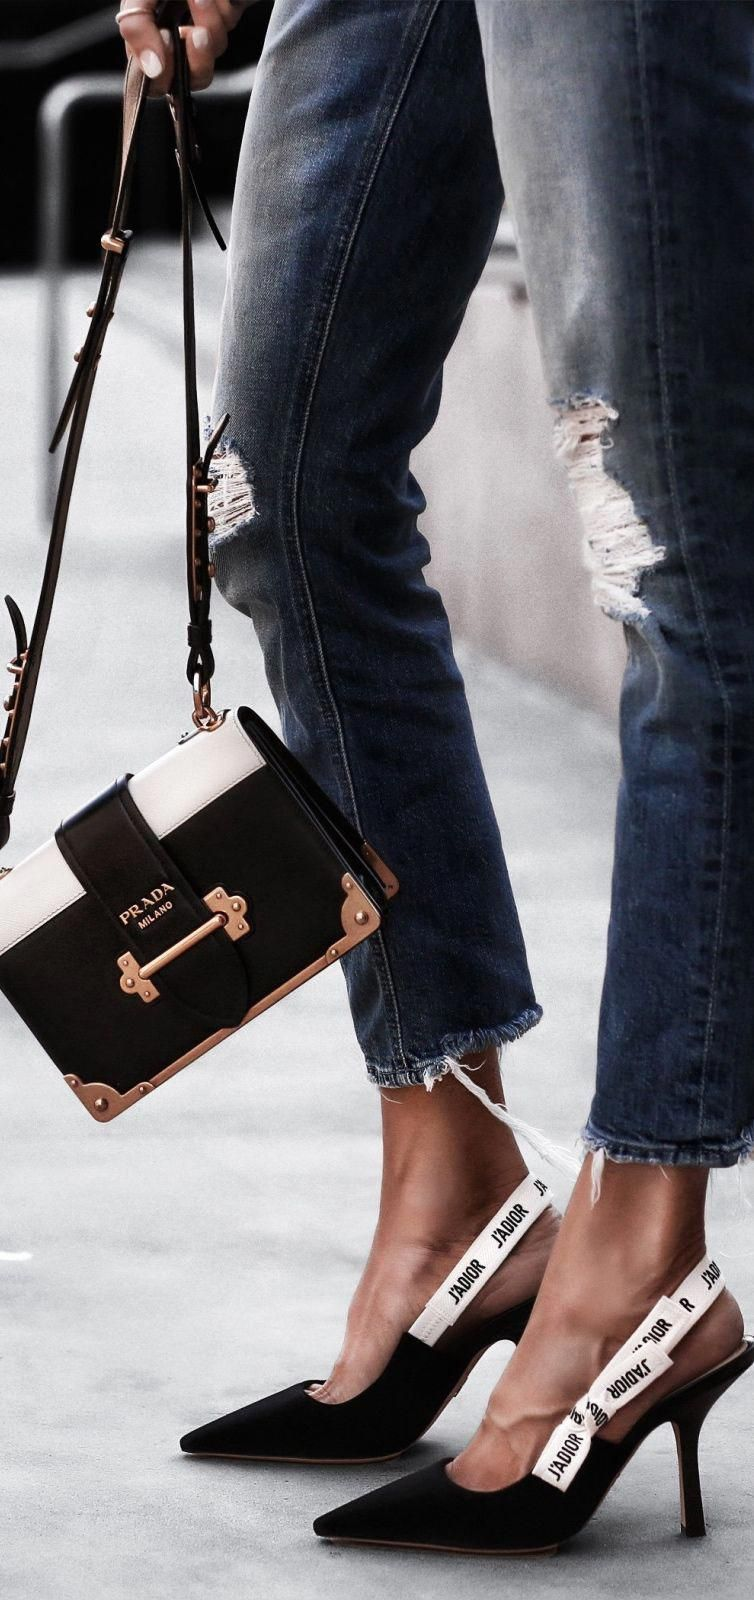 bdbd2758e154 prada handbags ioffer #Pradahandbags | Prada handbags in 2019 | Bags ...